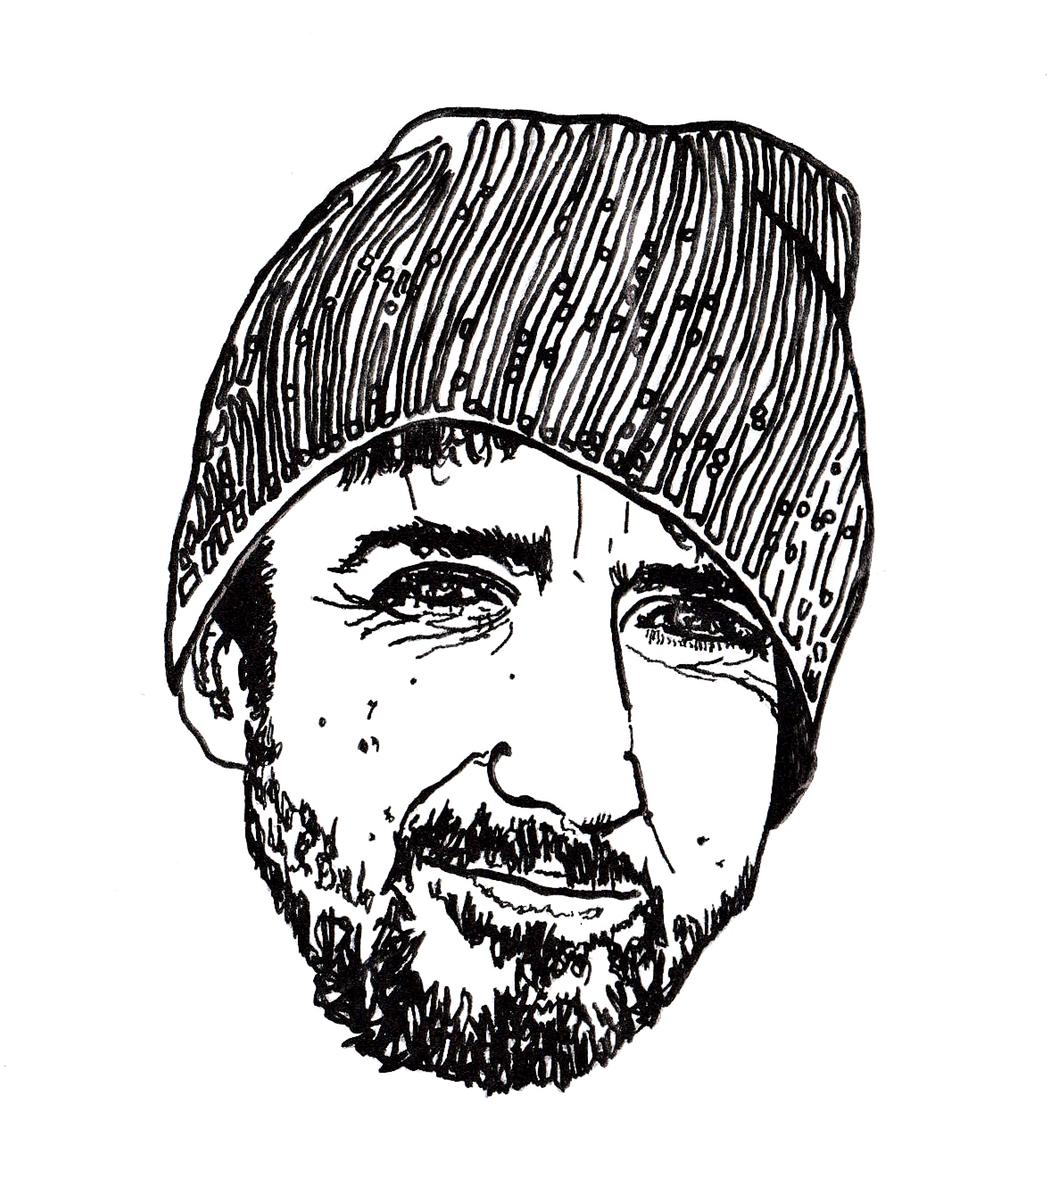 Deadbeat Illustration of E M I C